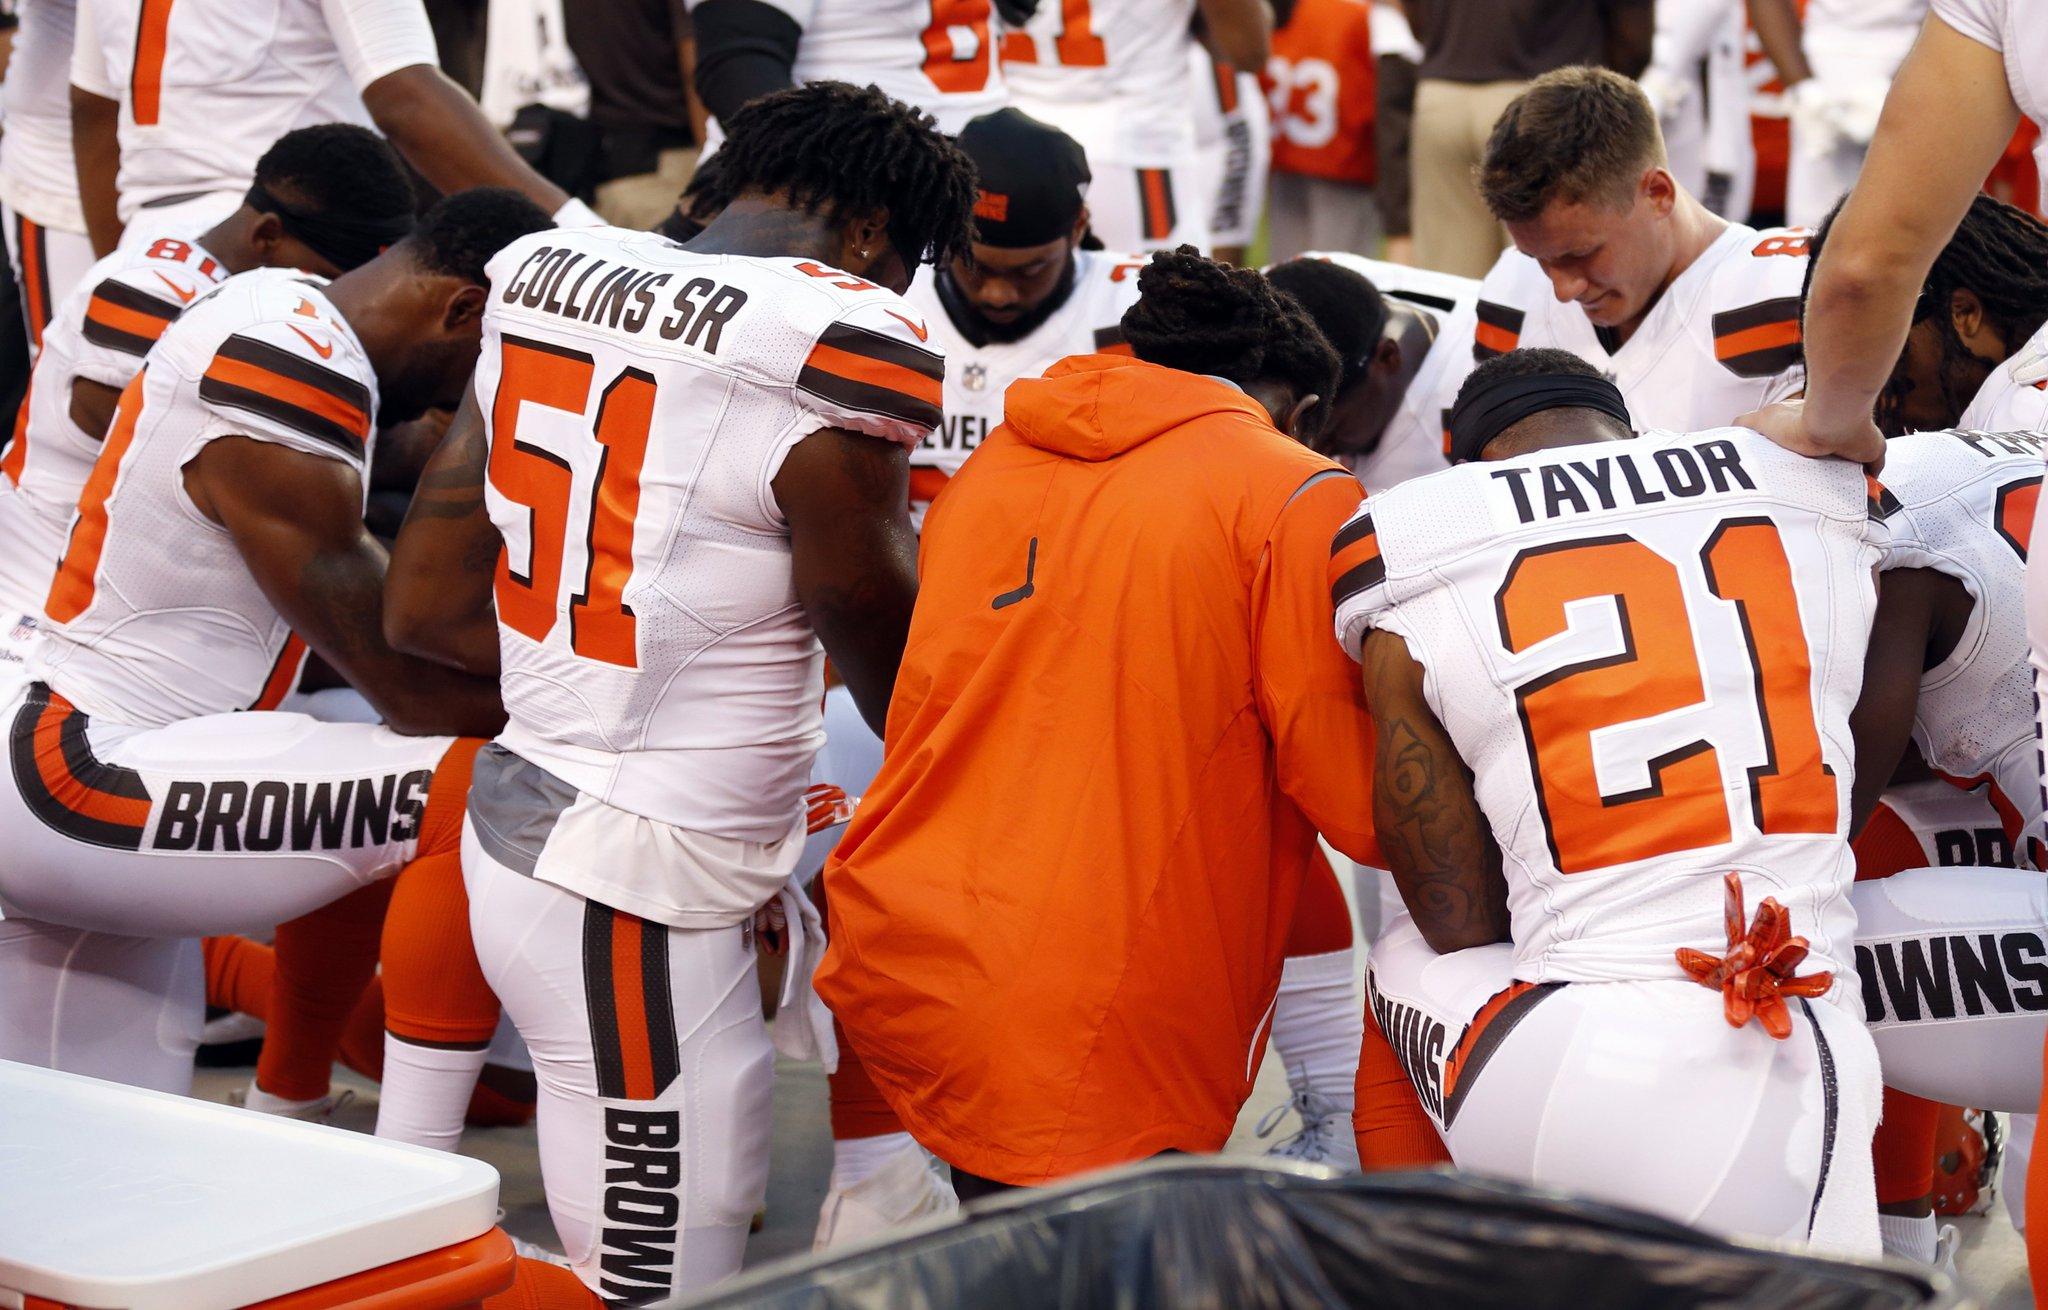 Multiple Browns players kneel together during national anthem https://t.co/MqYBjJKg1T https://t.co/DSIzu3qEVt